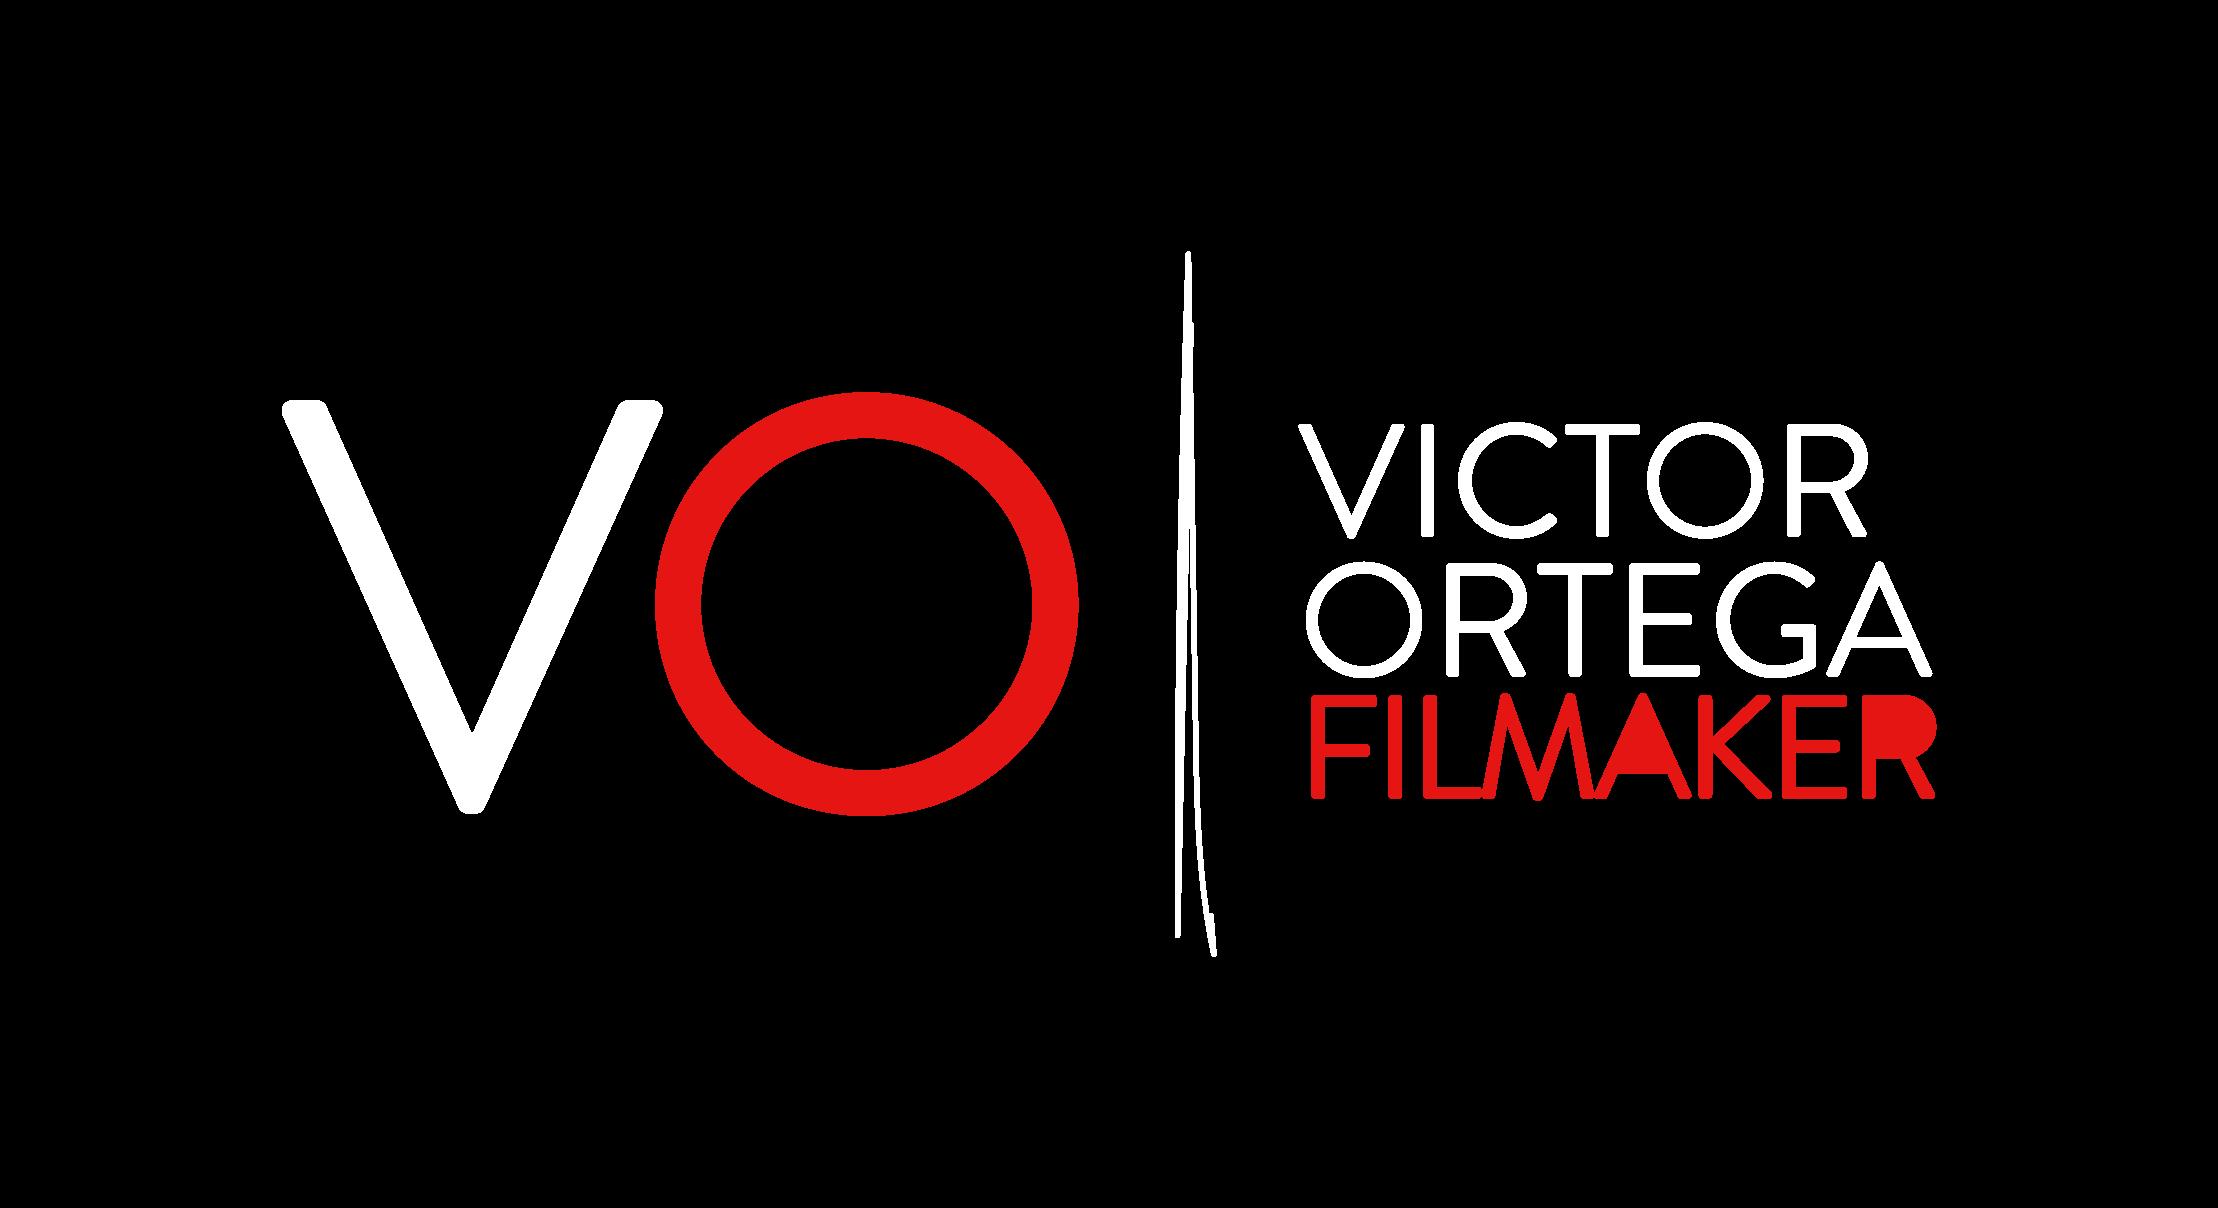 Victor Ortega - Filmmaker